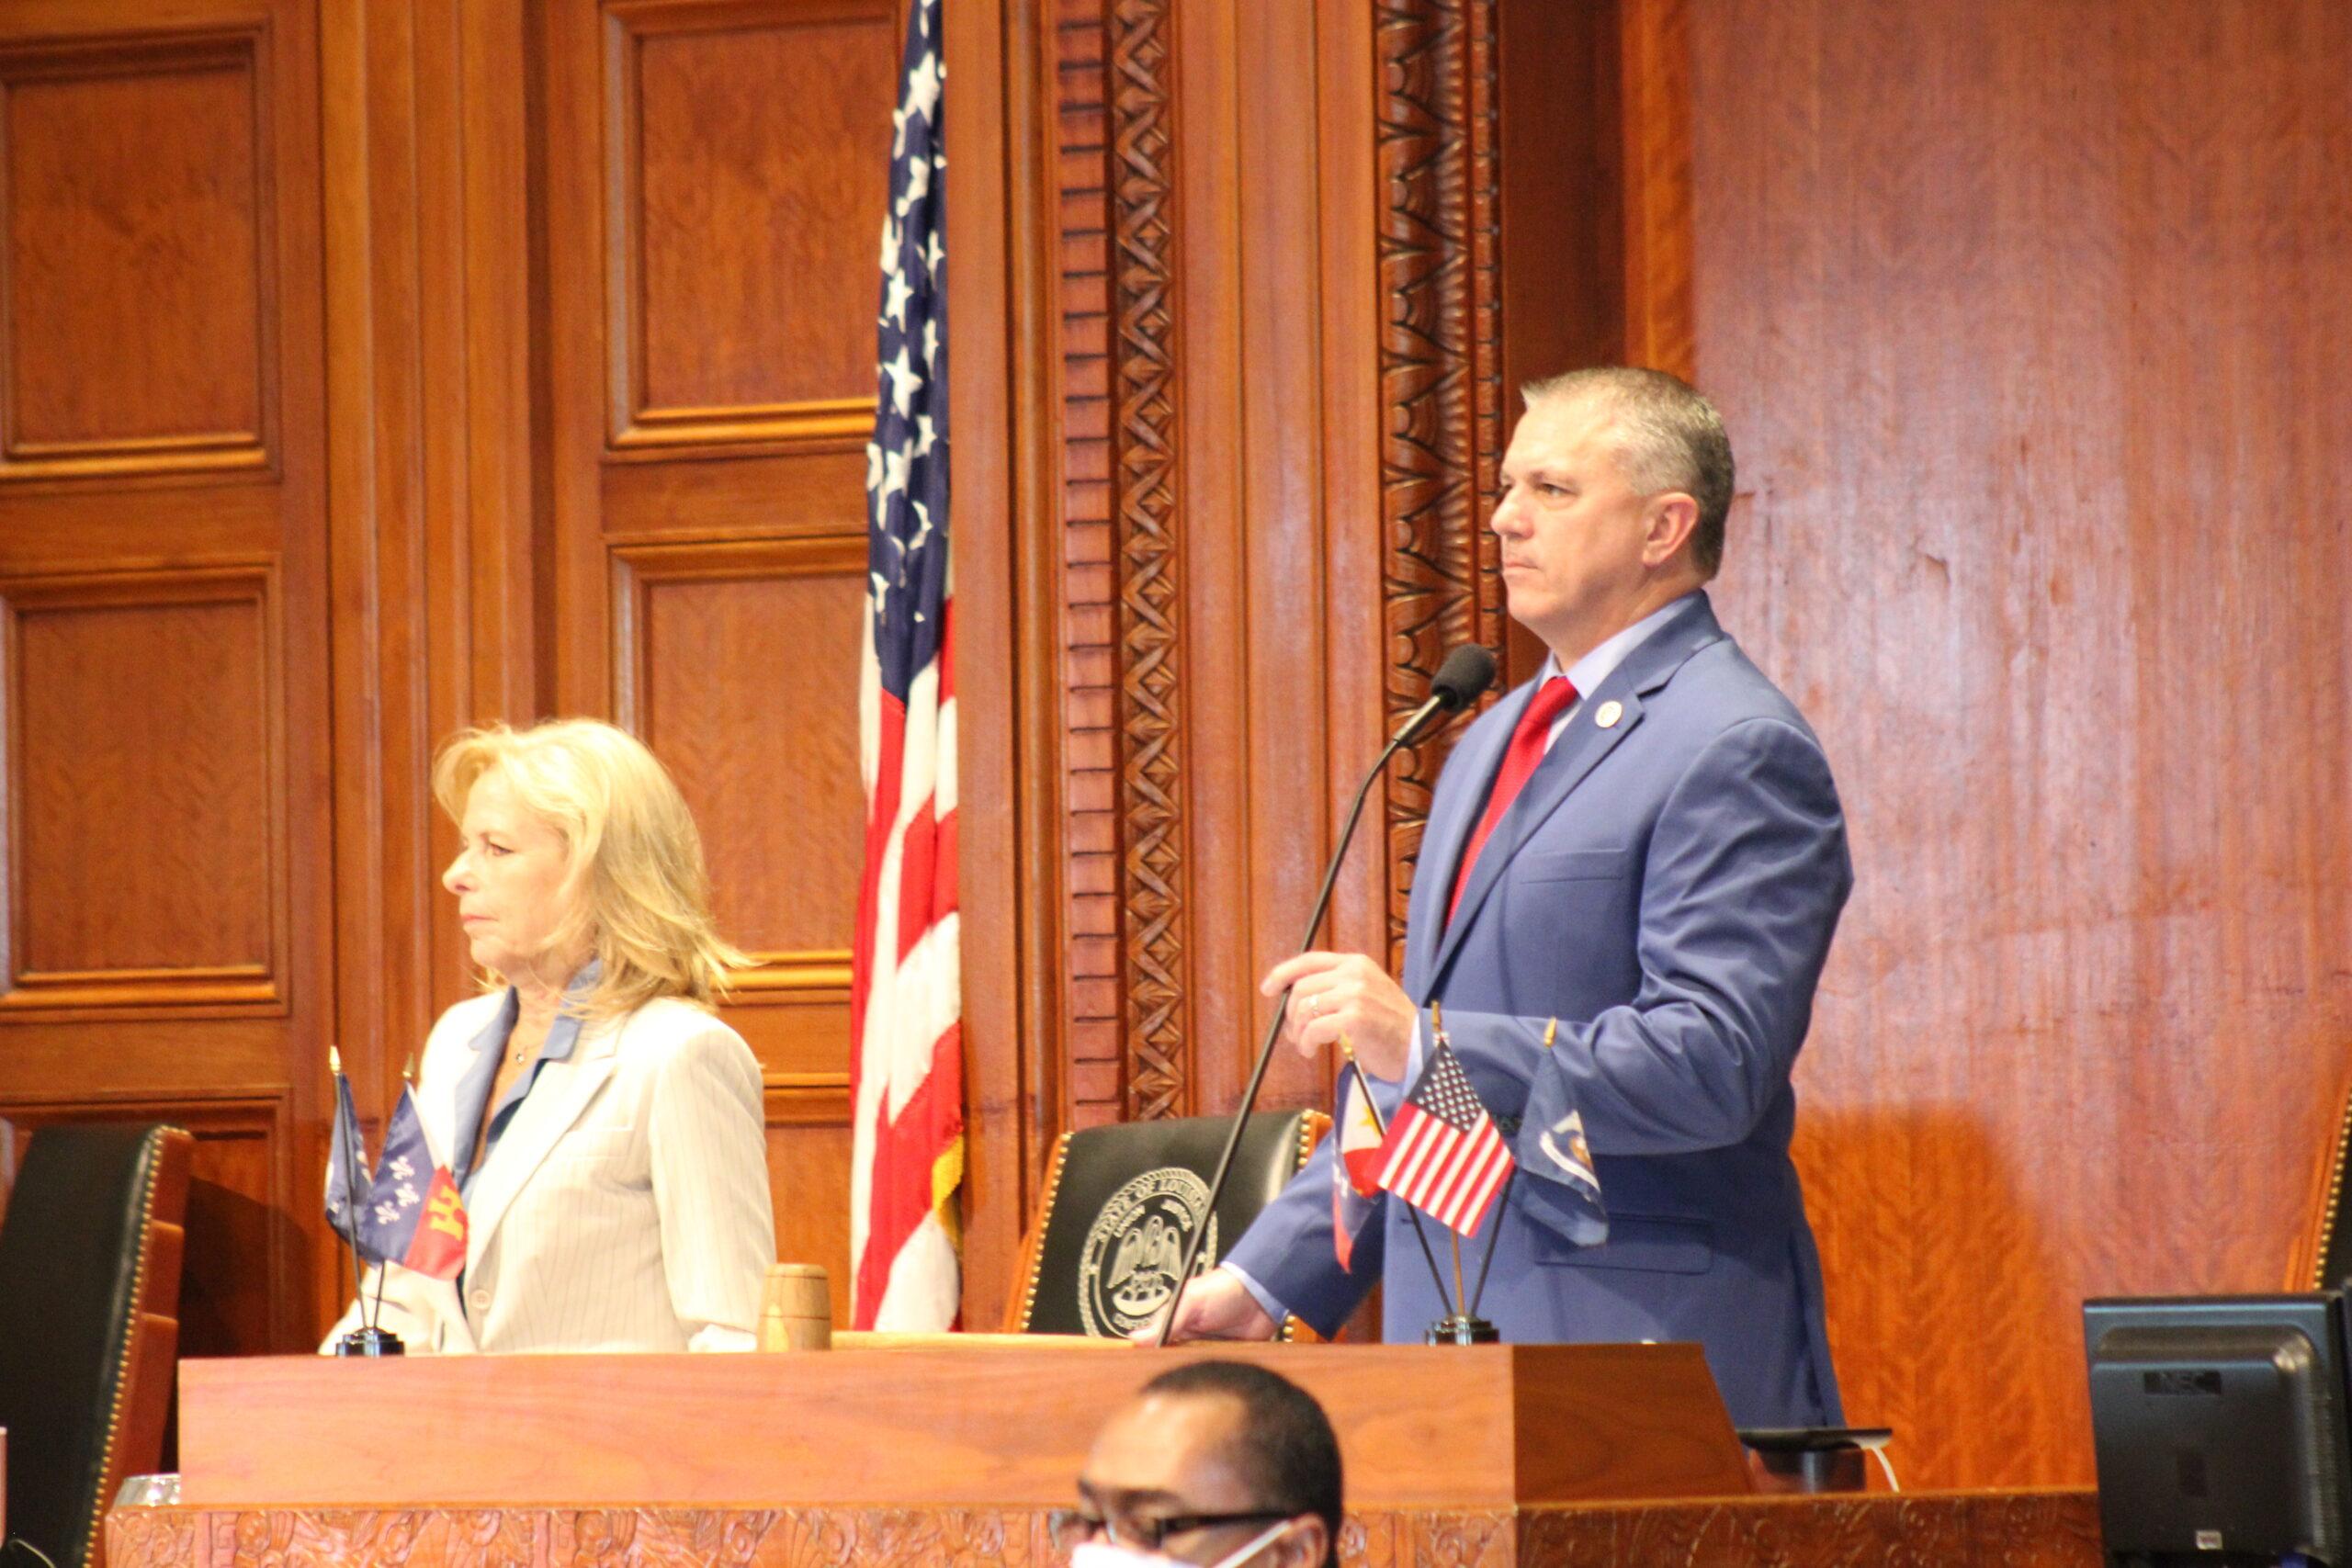 Louisiana's historic veto override session: Winners and losers